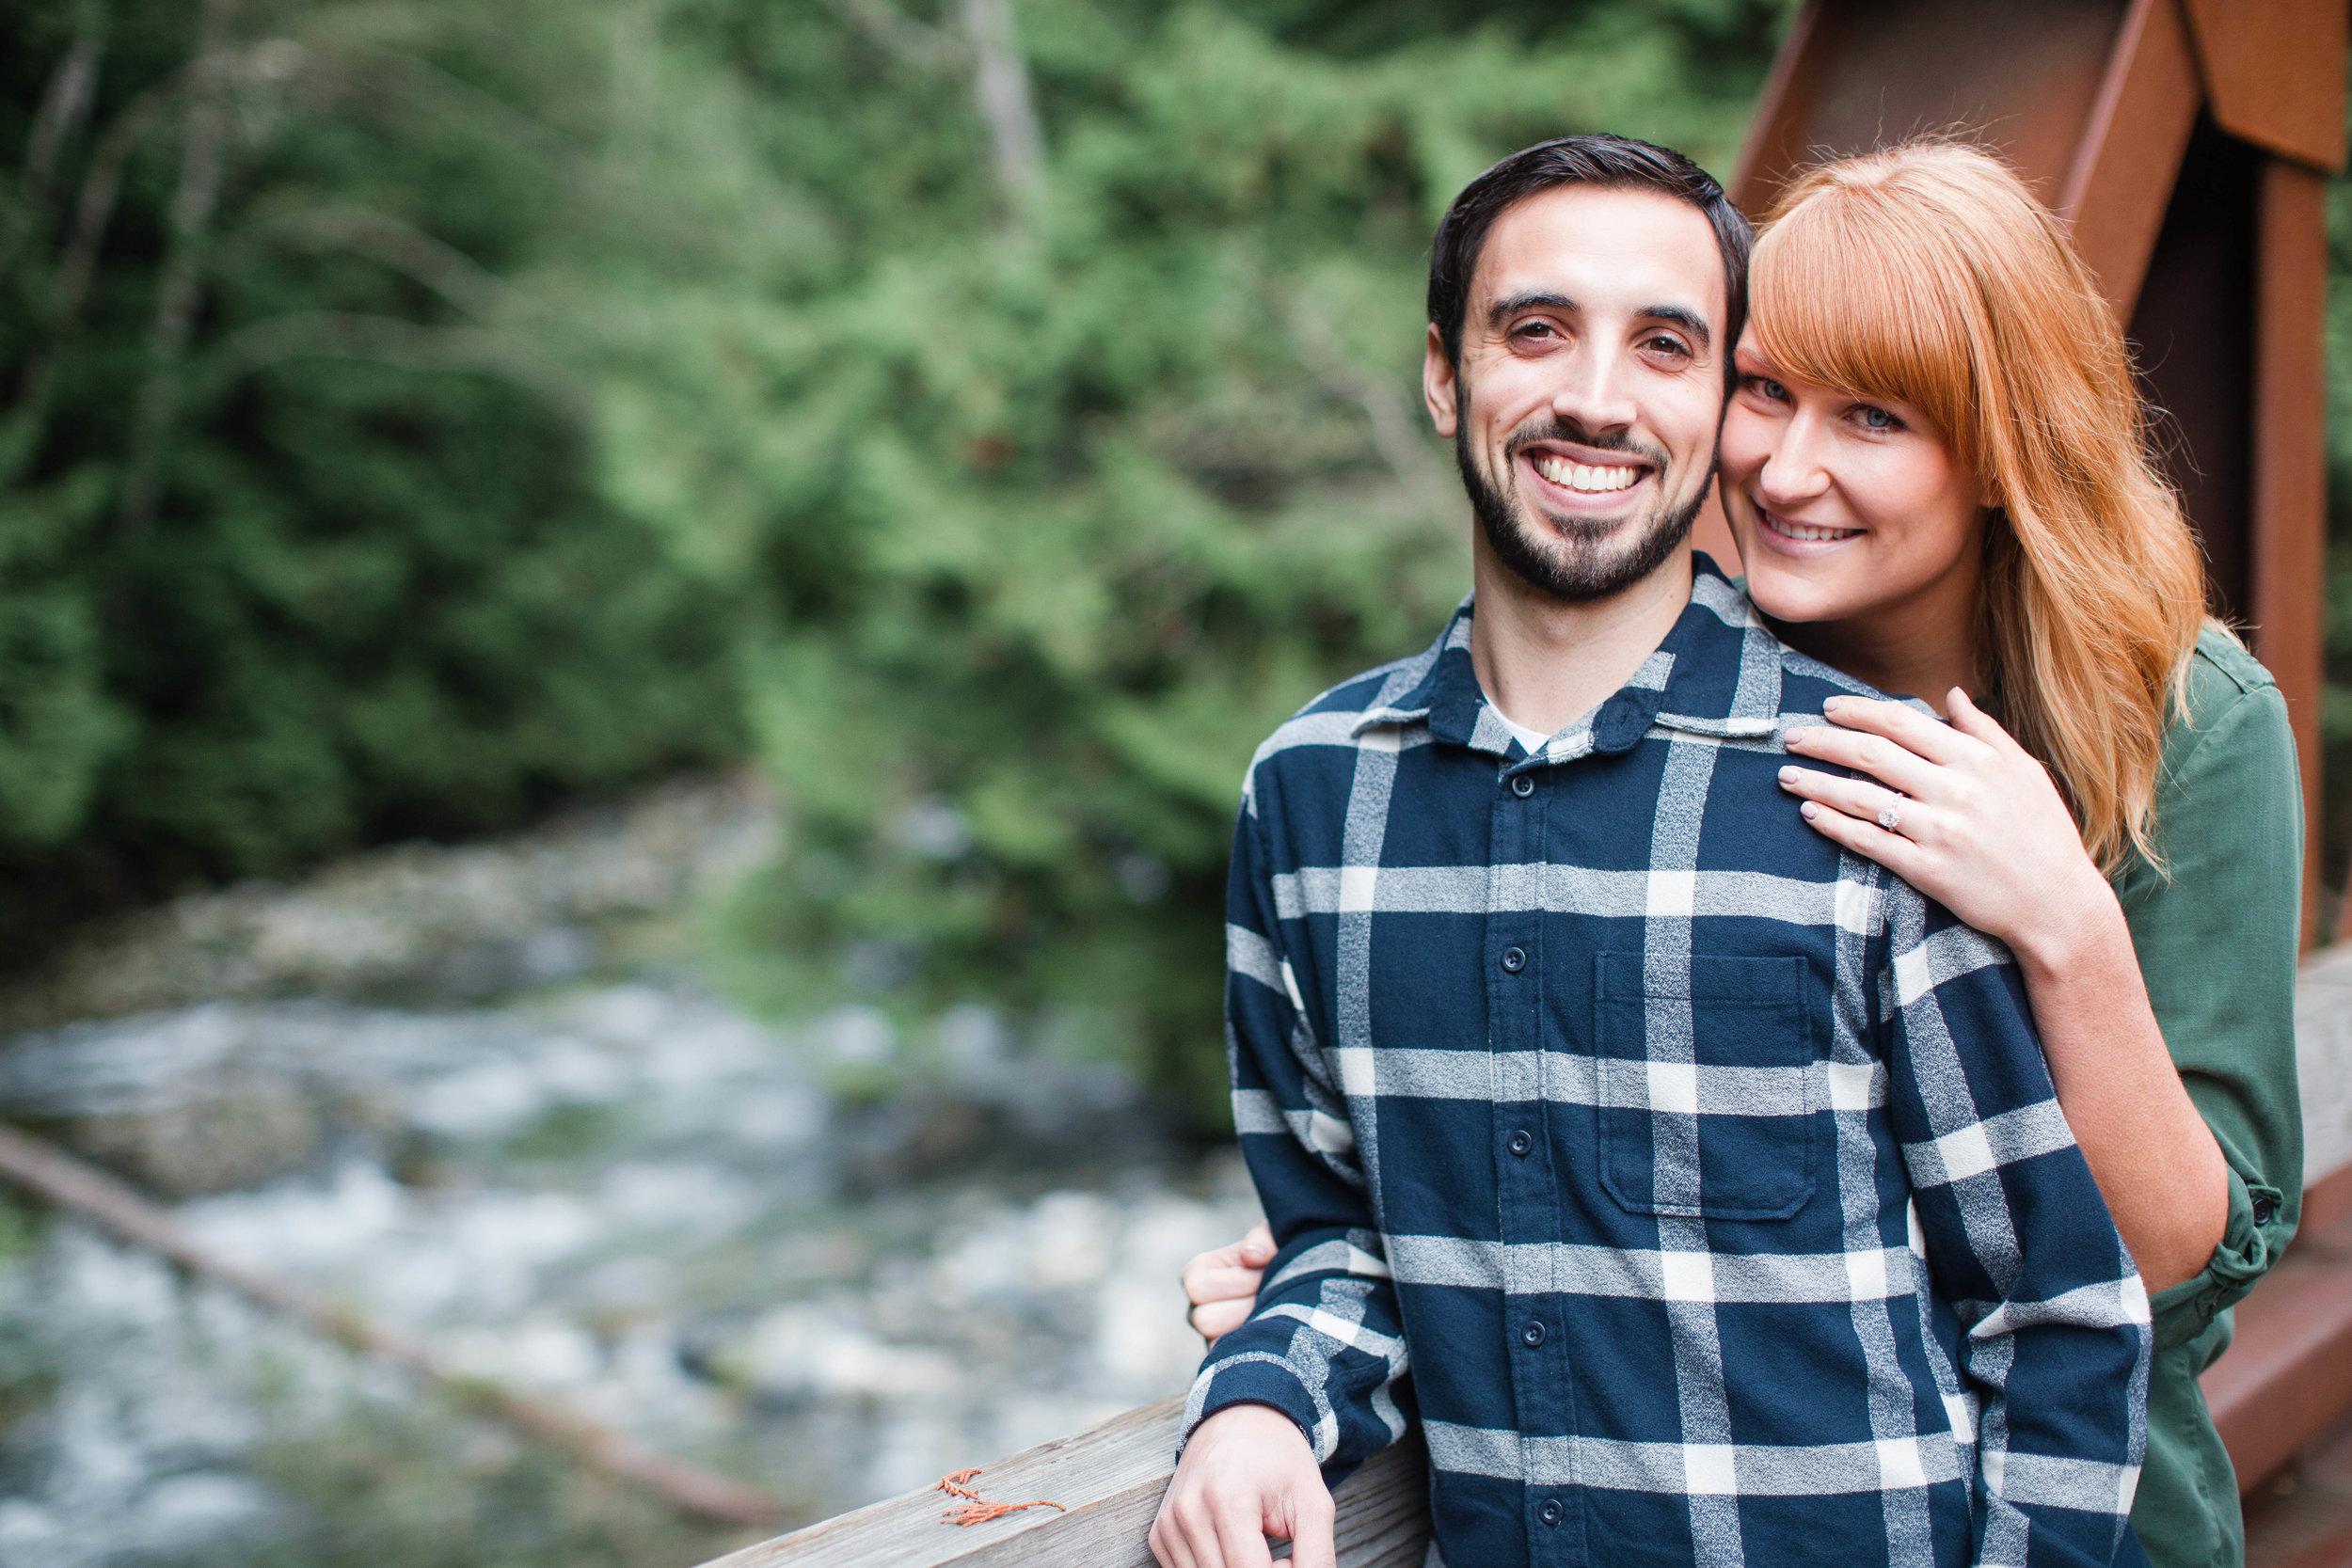 Ryan+Nicole_Franklin+Falls+Engagement_APW2016_8.JPG